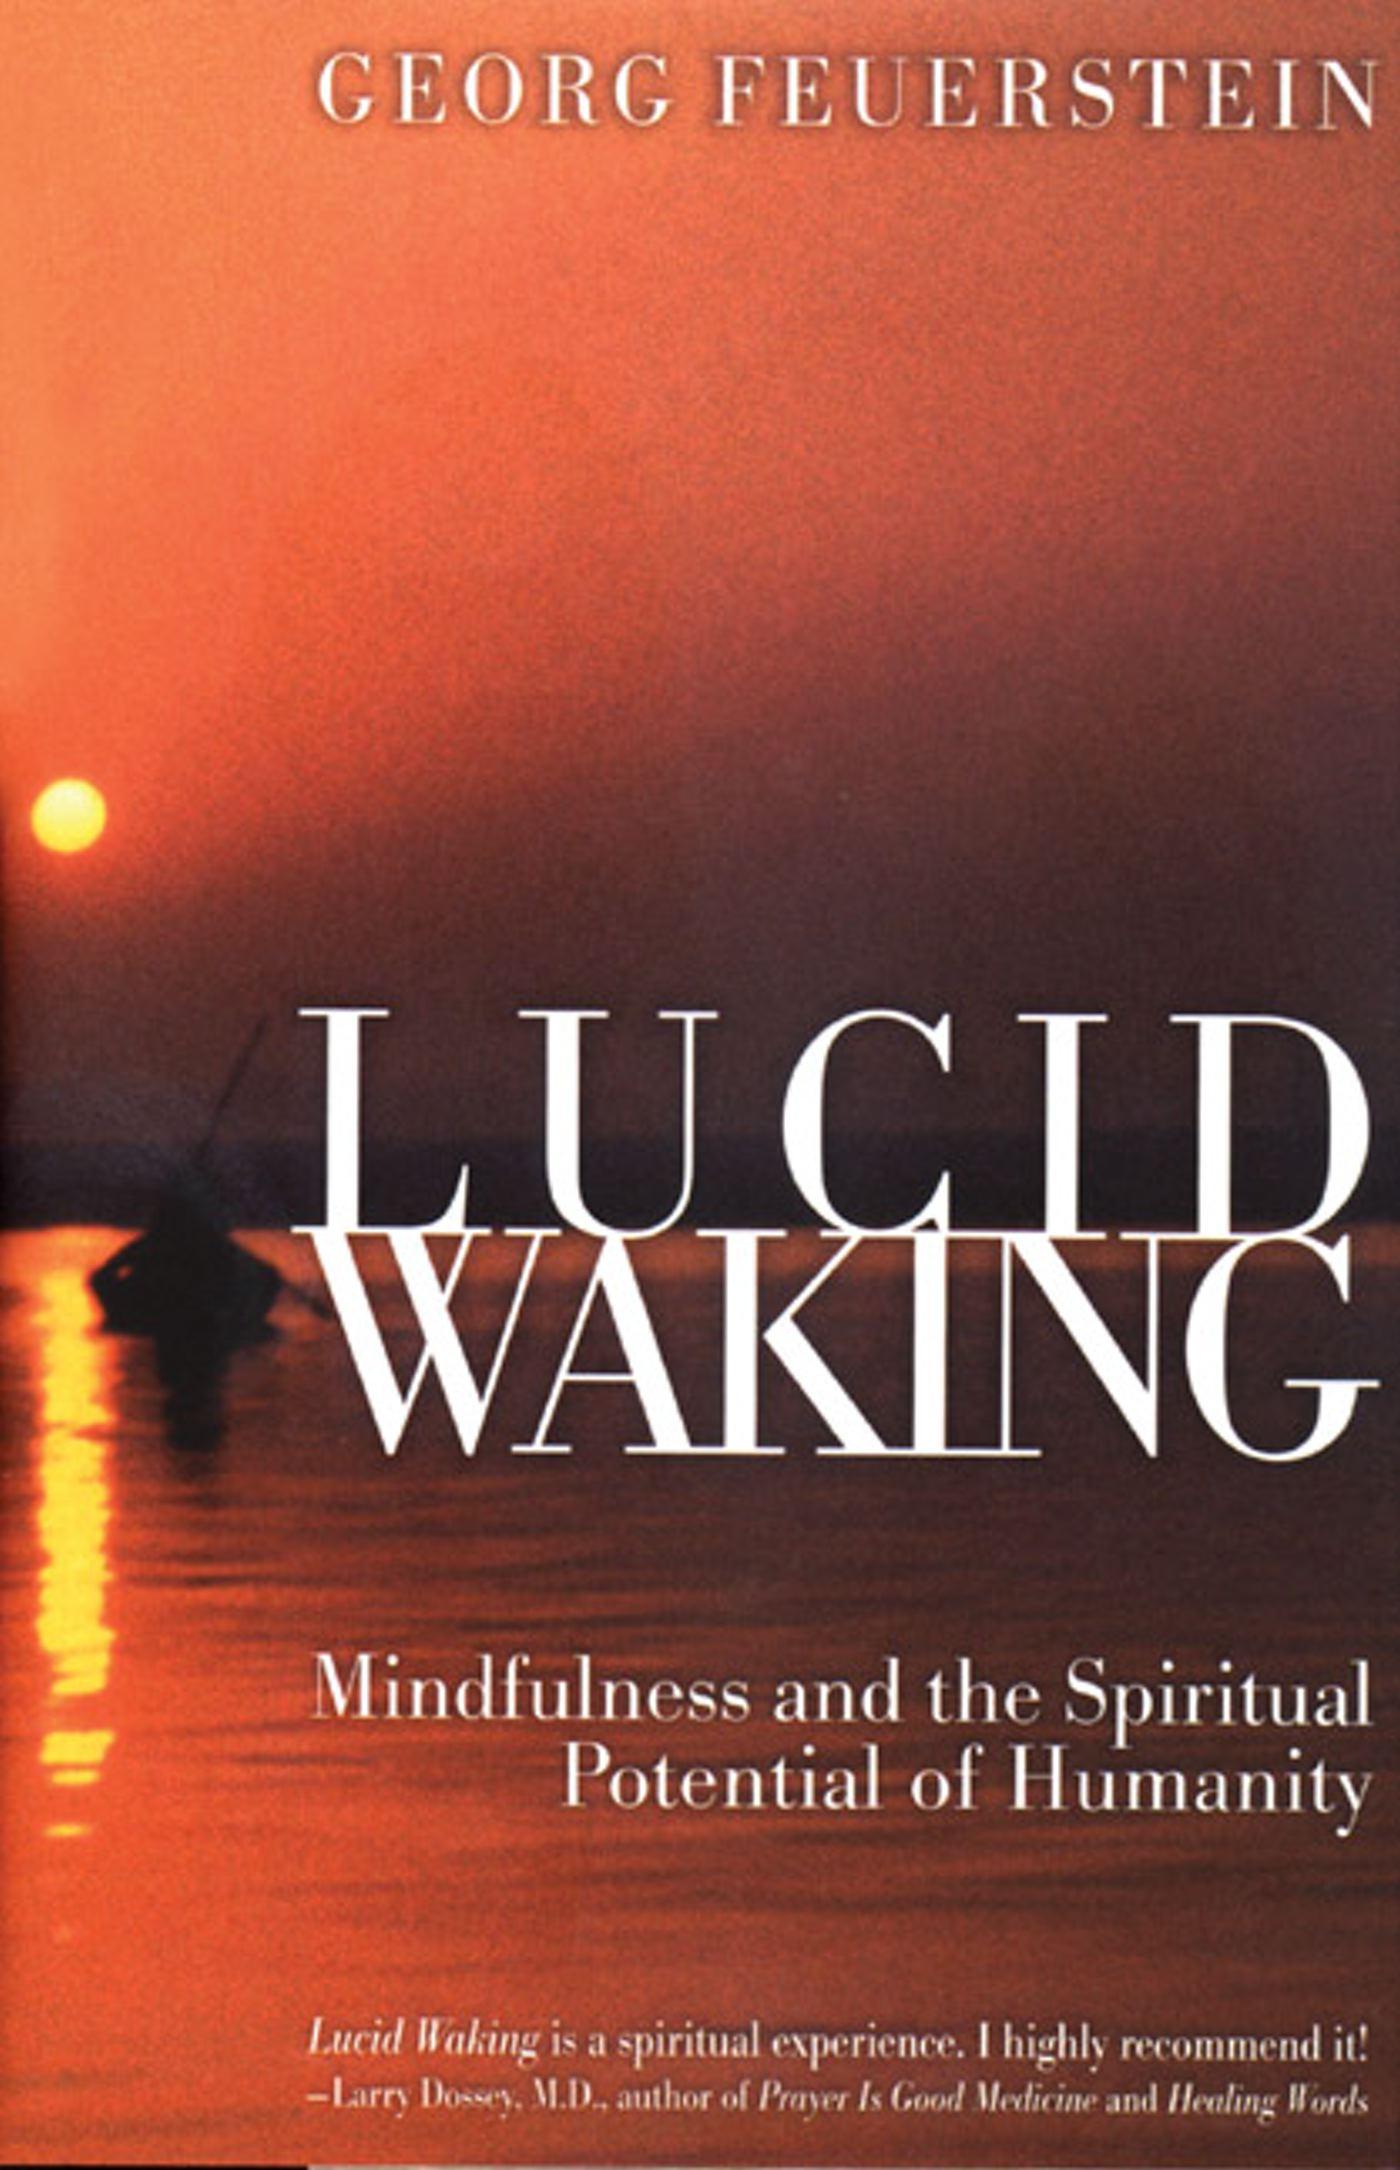 Lucid waking 9780892816132 hr